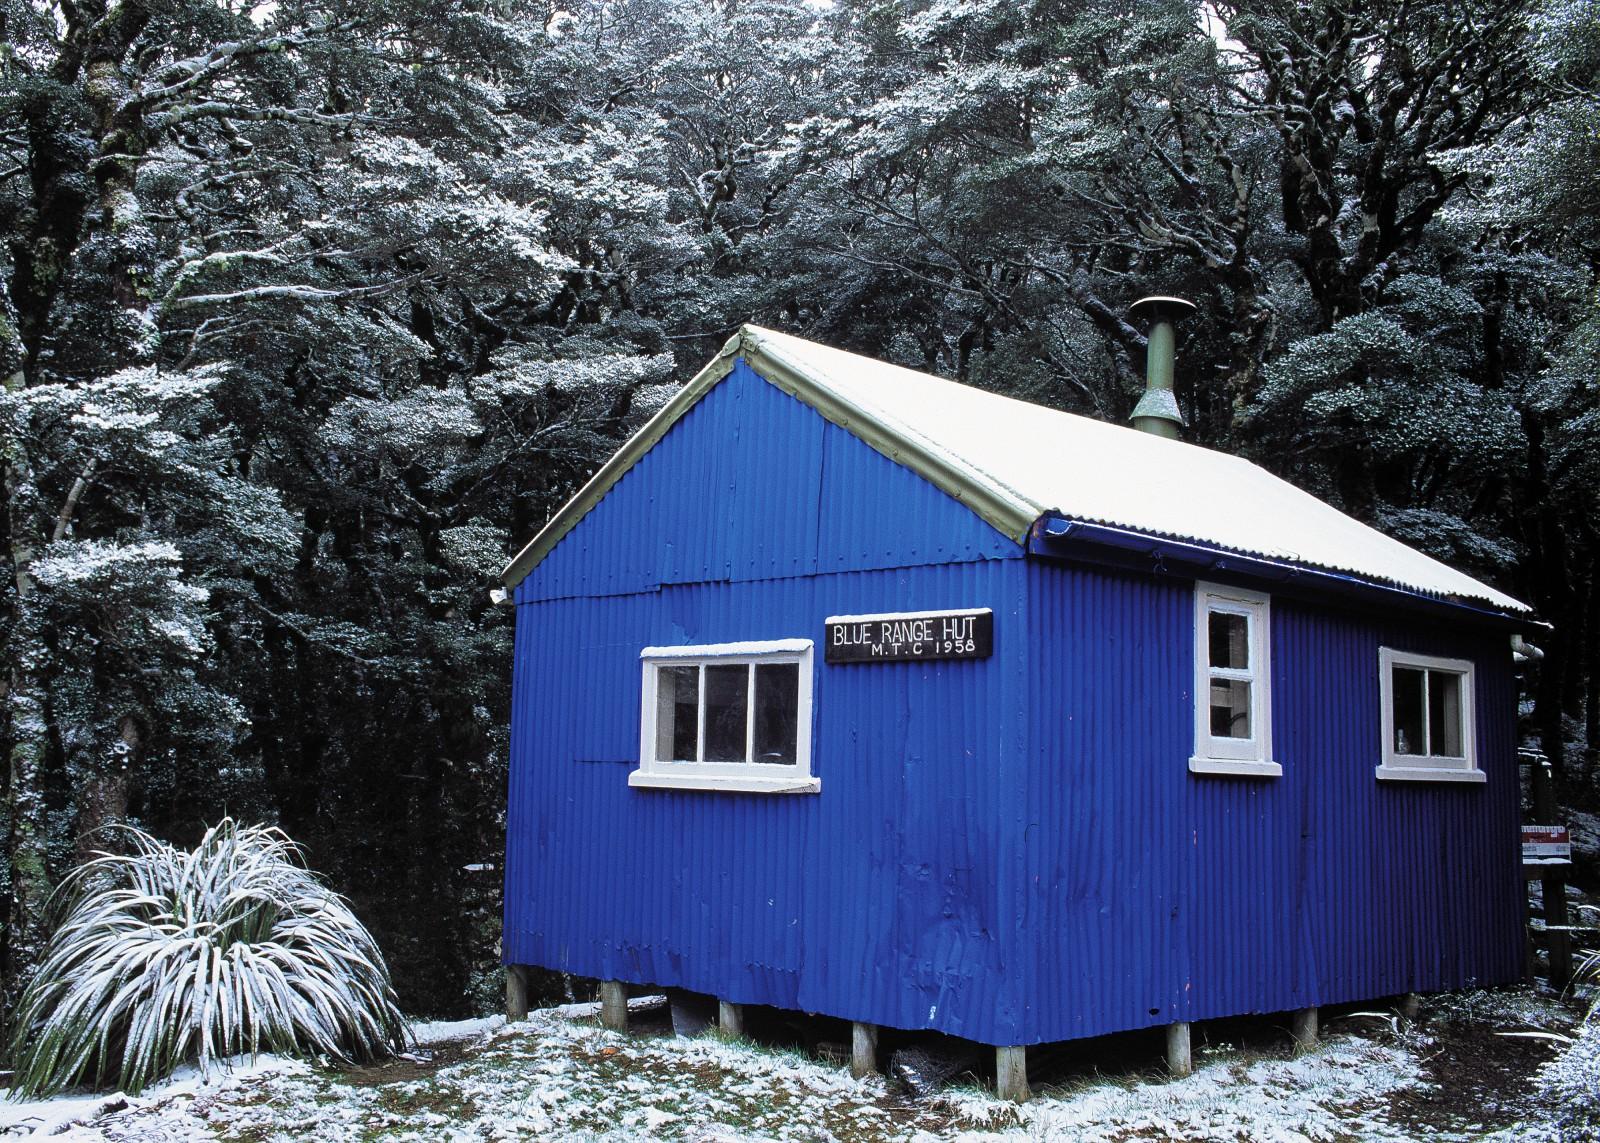 Blue Range Hut, Tararua Forest Park.